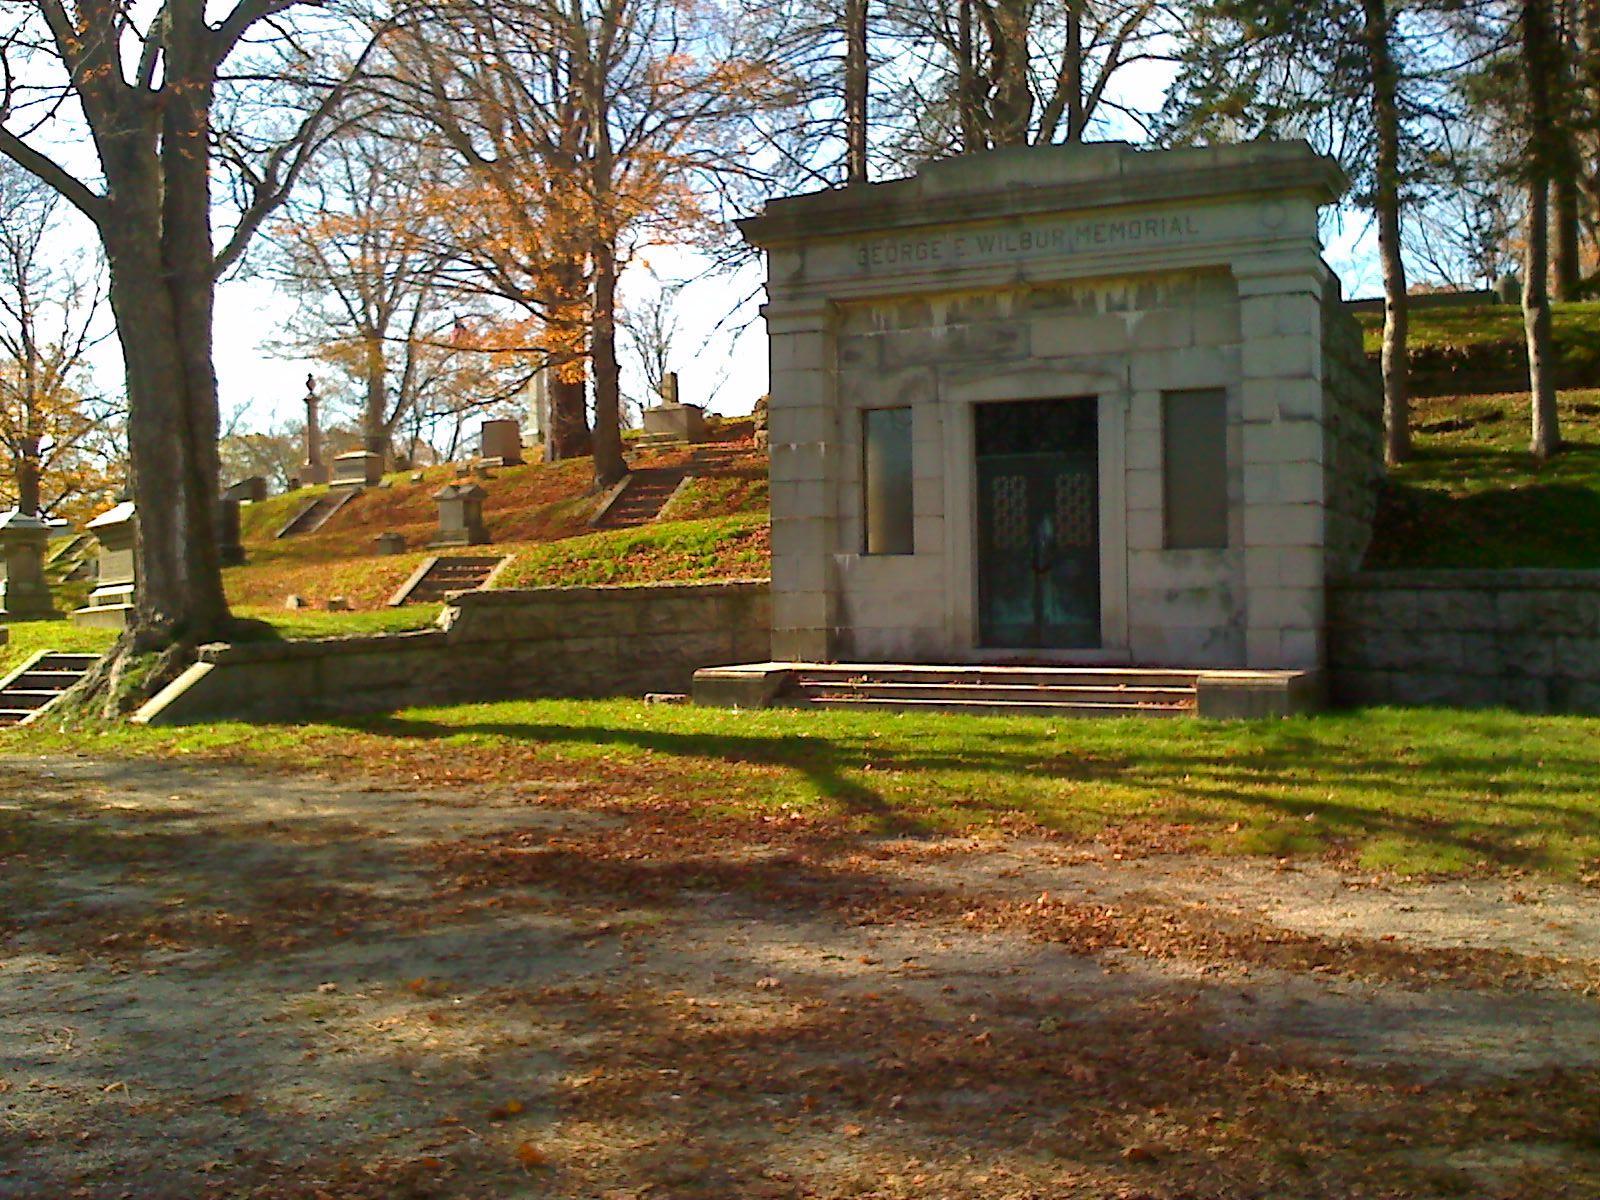 George E. Wilbur Memorial at the Mount Pleasant Cemetery (Courtesy of the Taunton Daily Gazette)